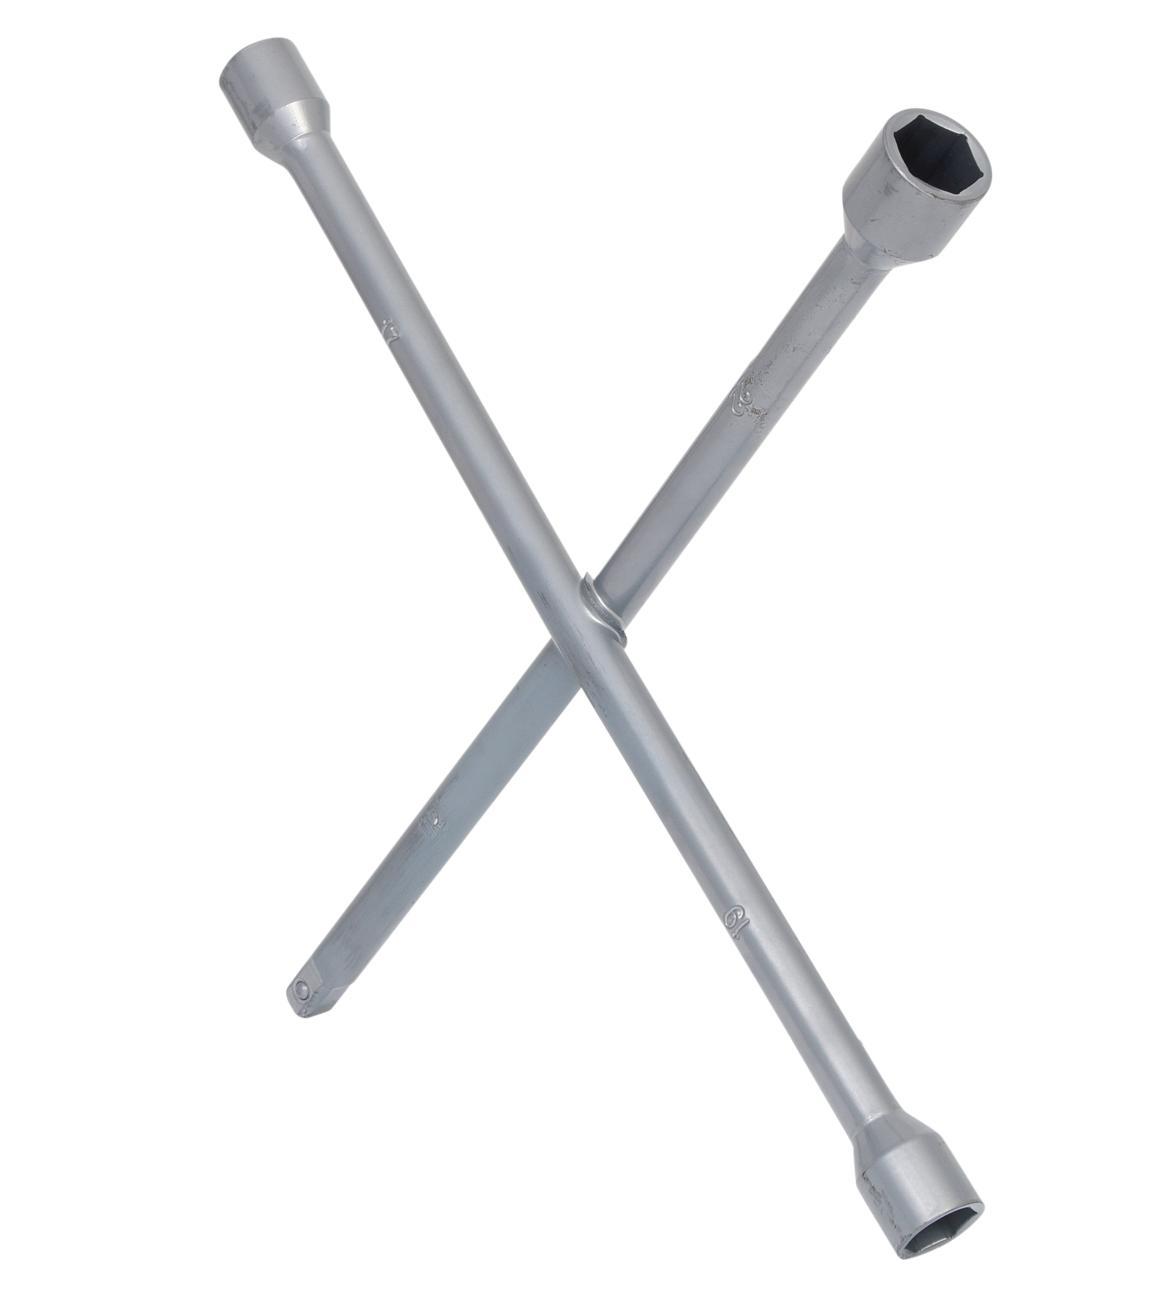 Ks Tools 518 1150 Radkreuzschlüssel Für Pkws 1 2 X17x19x22mm Auto